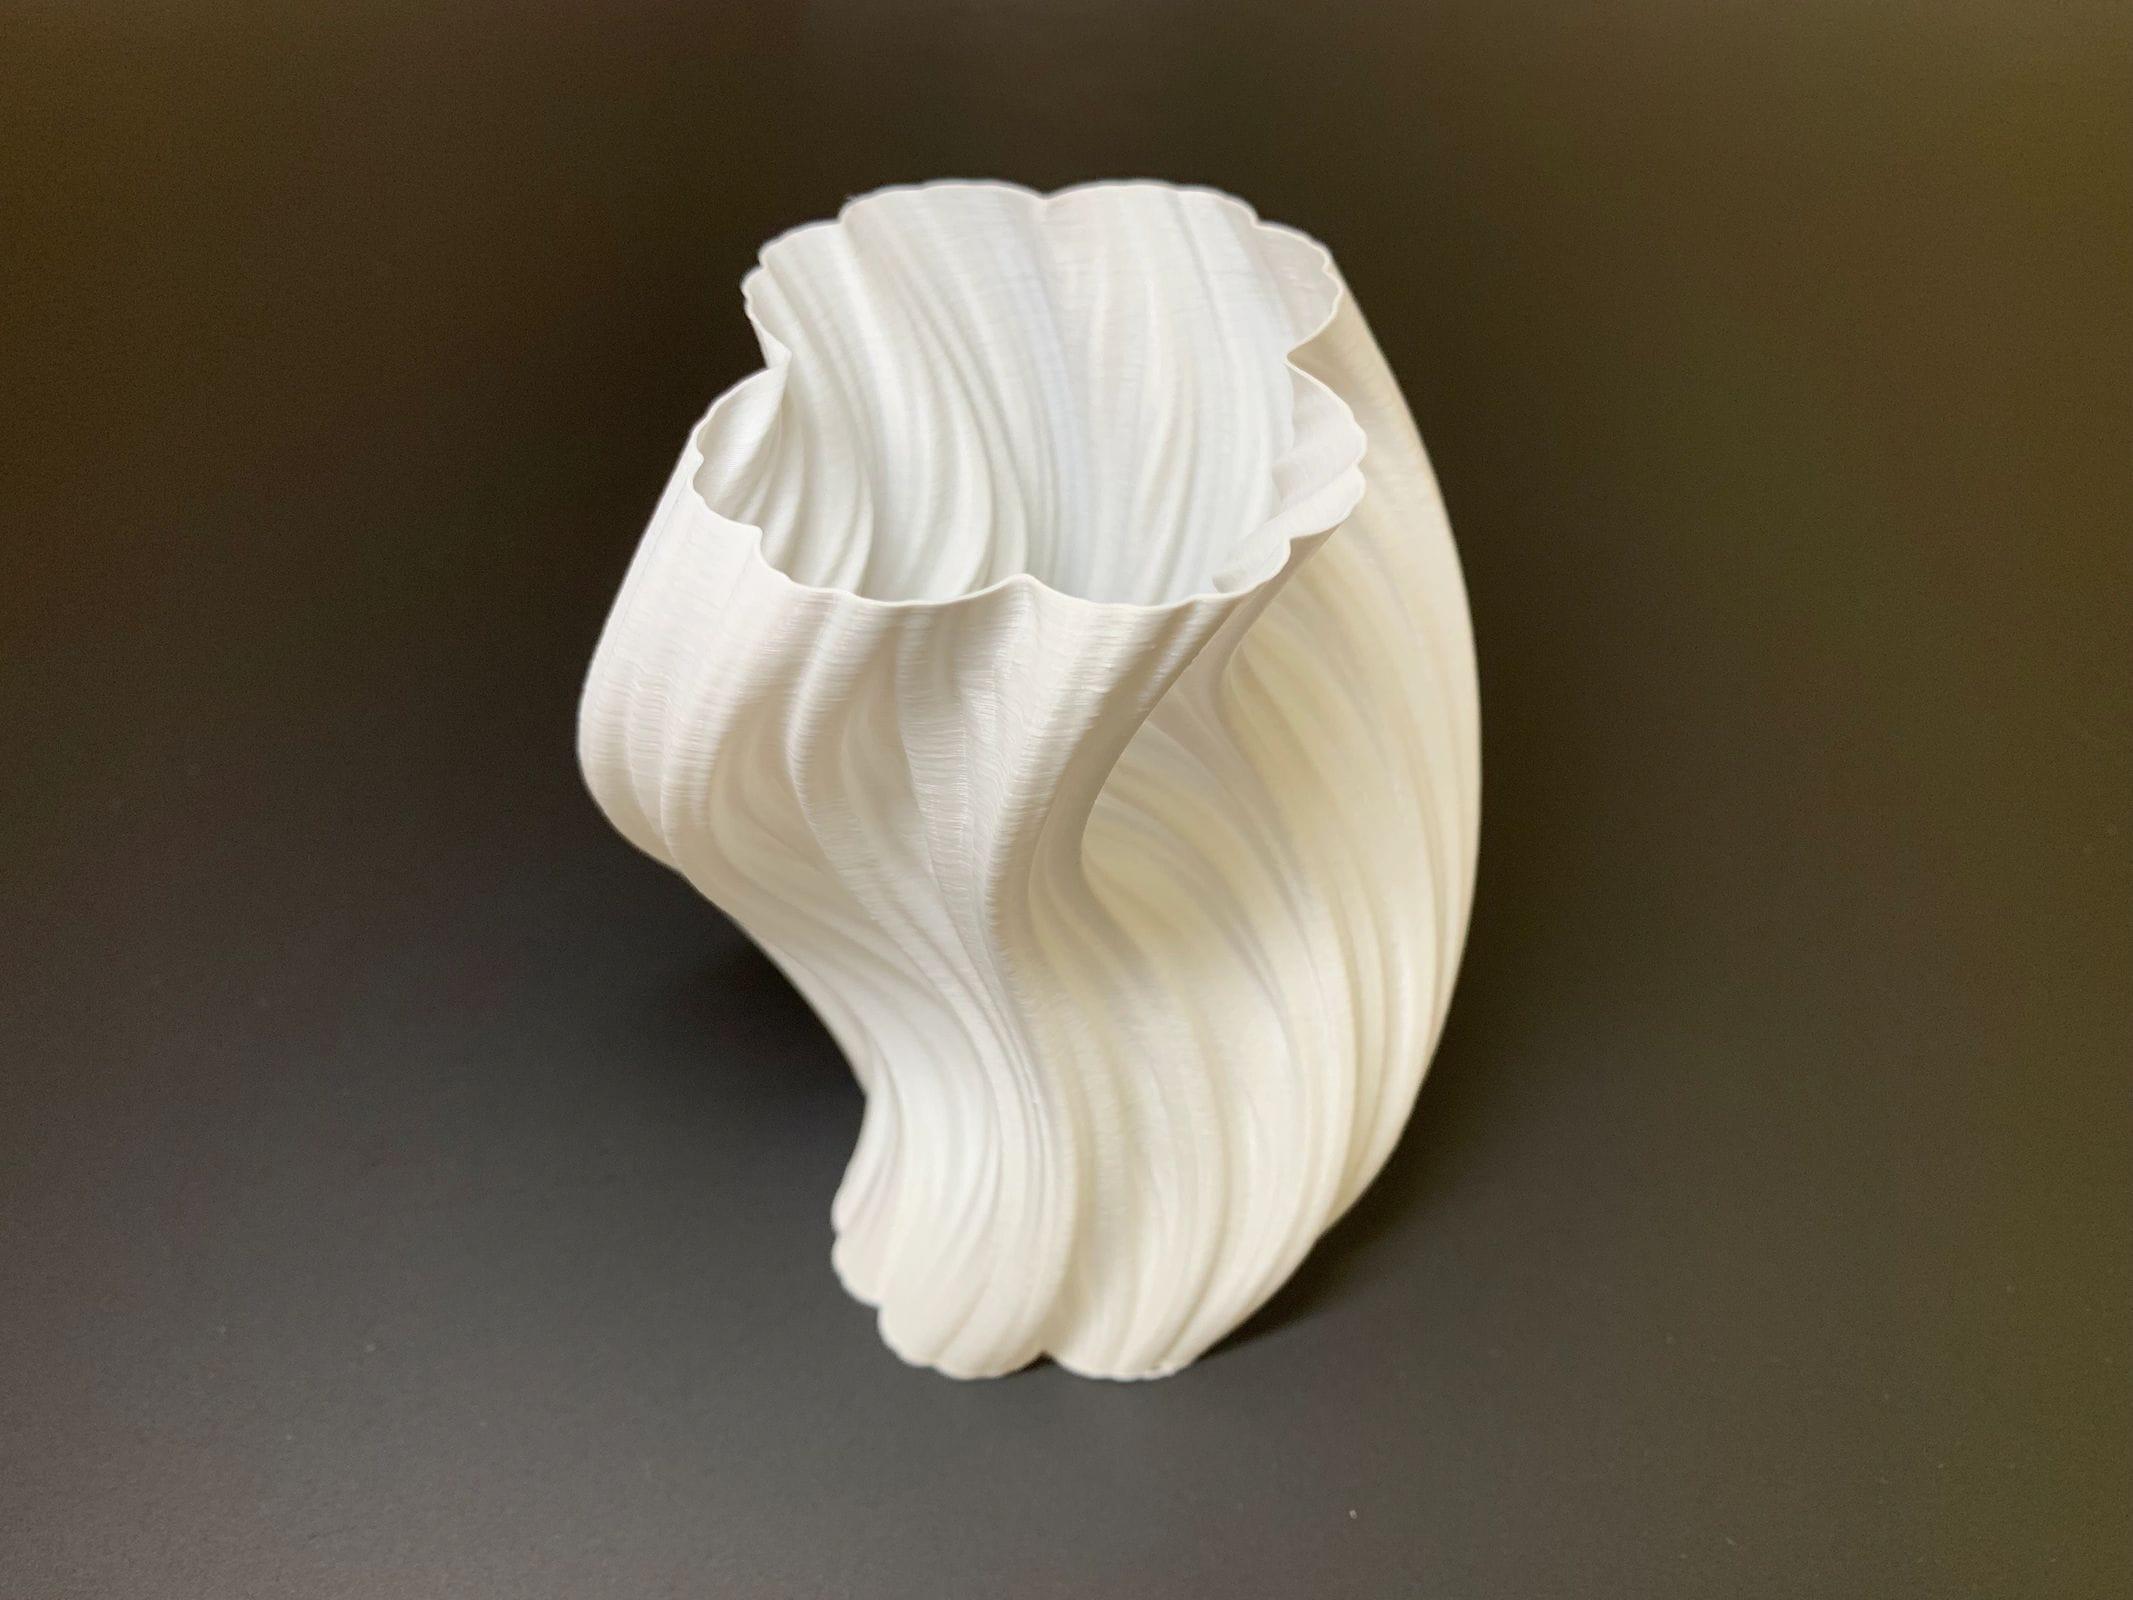 FDM Printed Vase